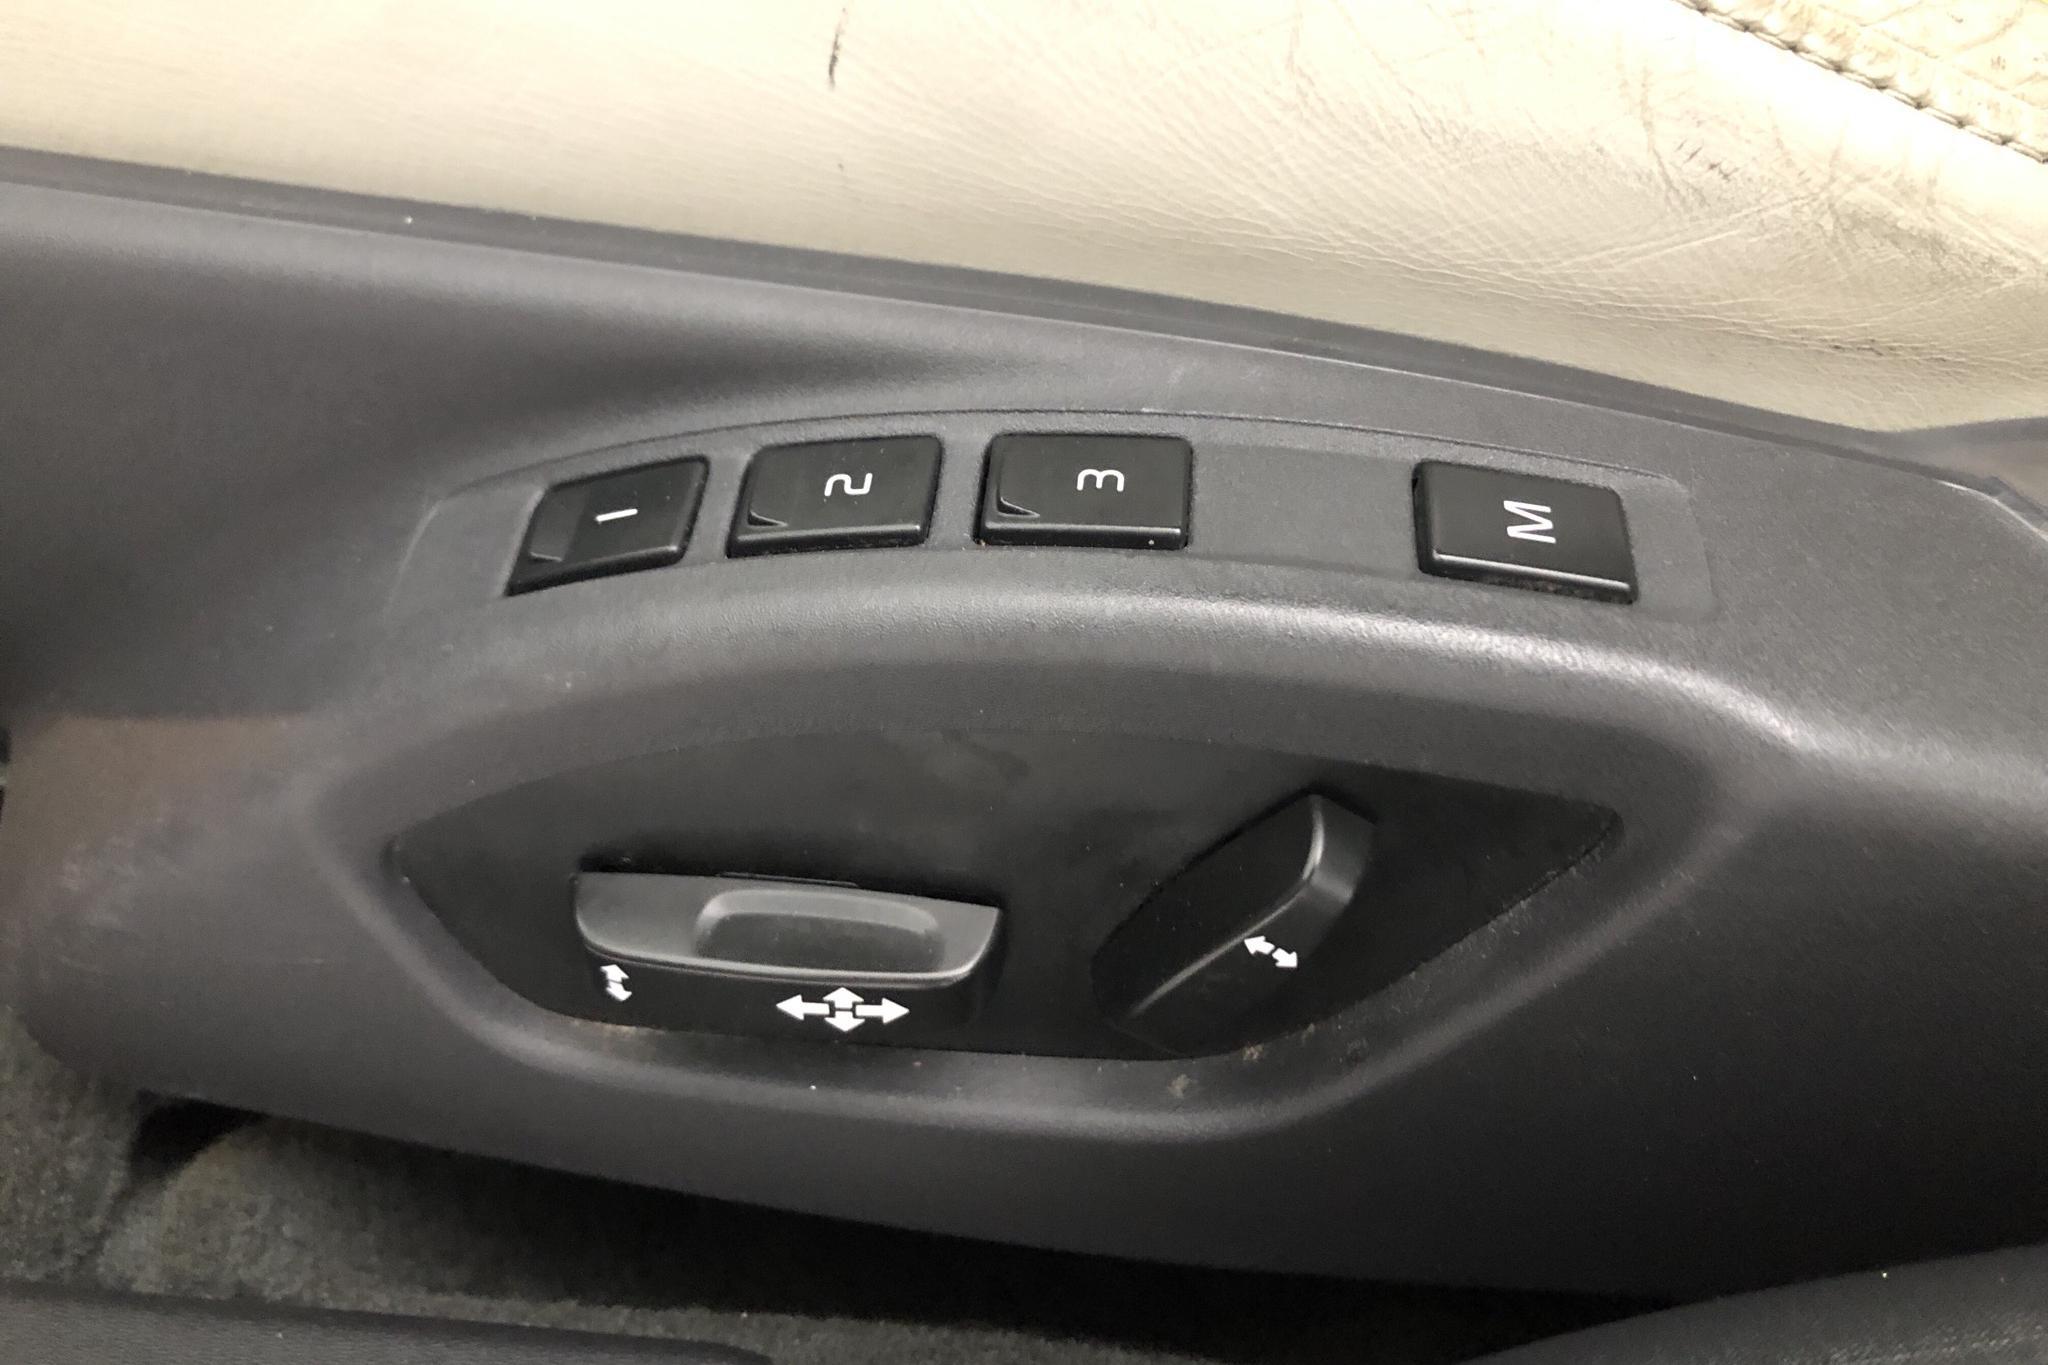 Volvo V70 D5 (215hk) - 23 445 mil - Manuell - röd - 2014